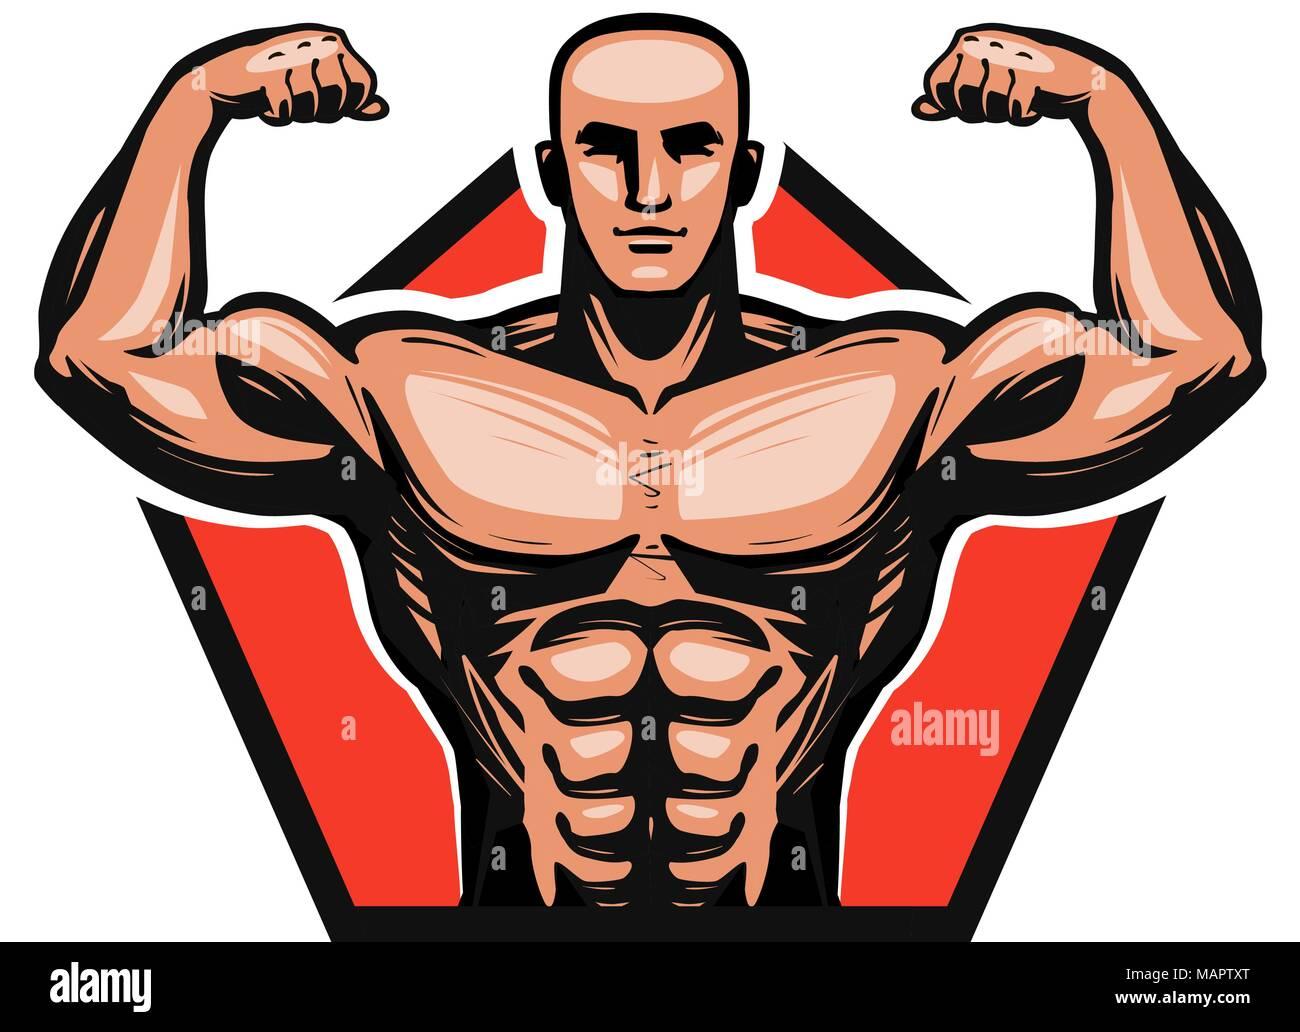 Gym, bodybuilding, fitness logo or label. Muscle male or bodybuilder. Vector illustration - Stock Vector